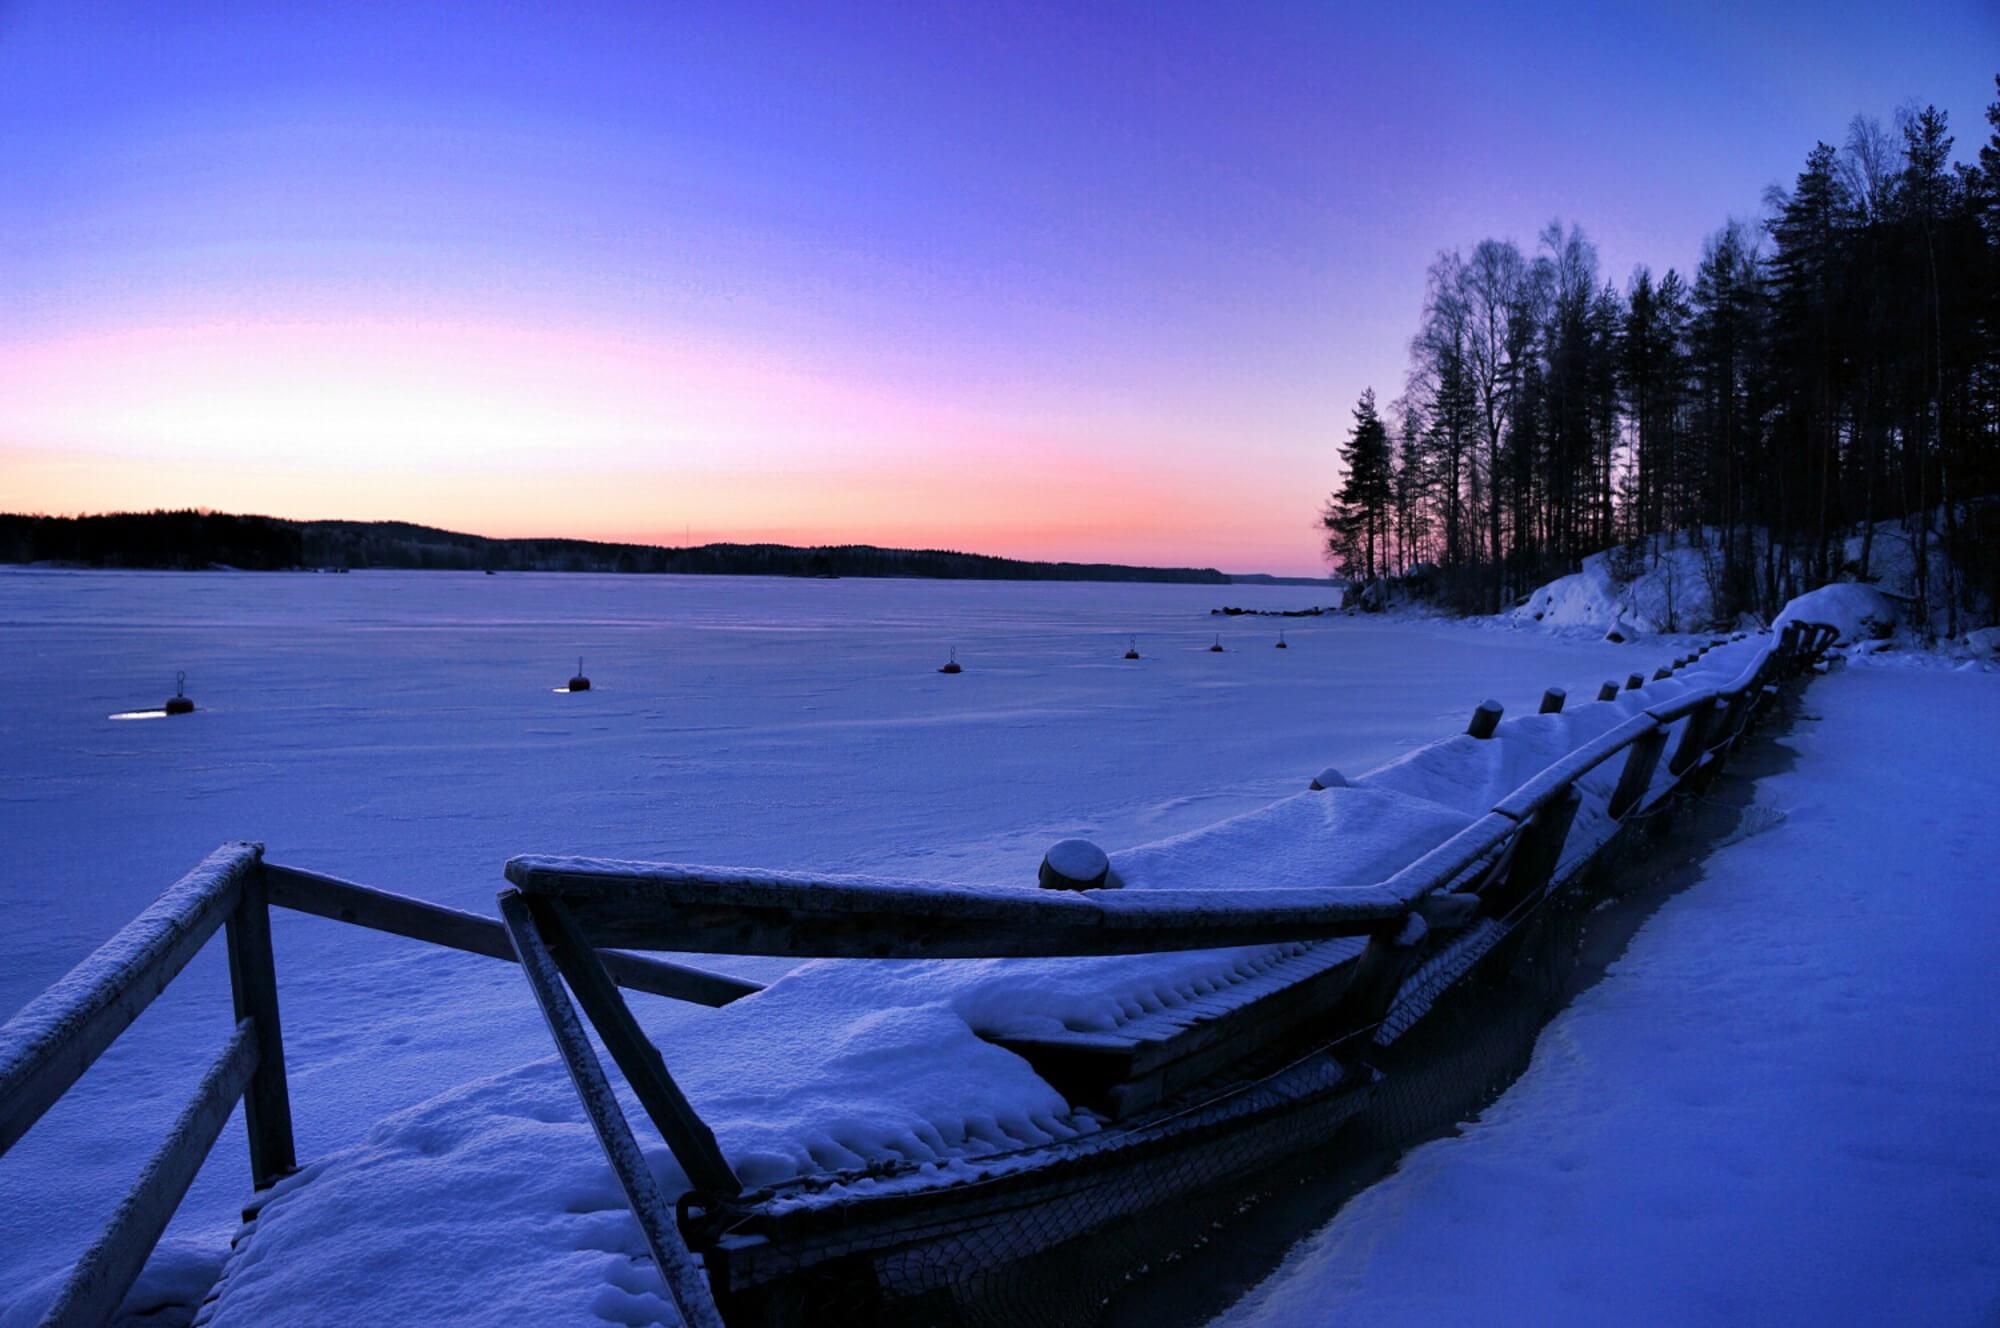 mikkeli en finlande